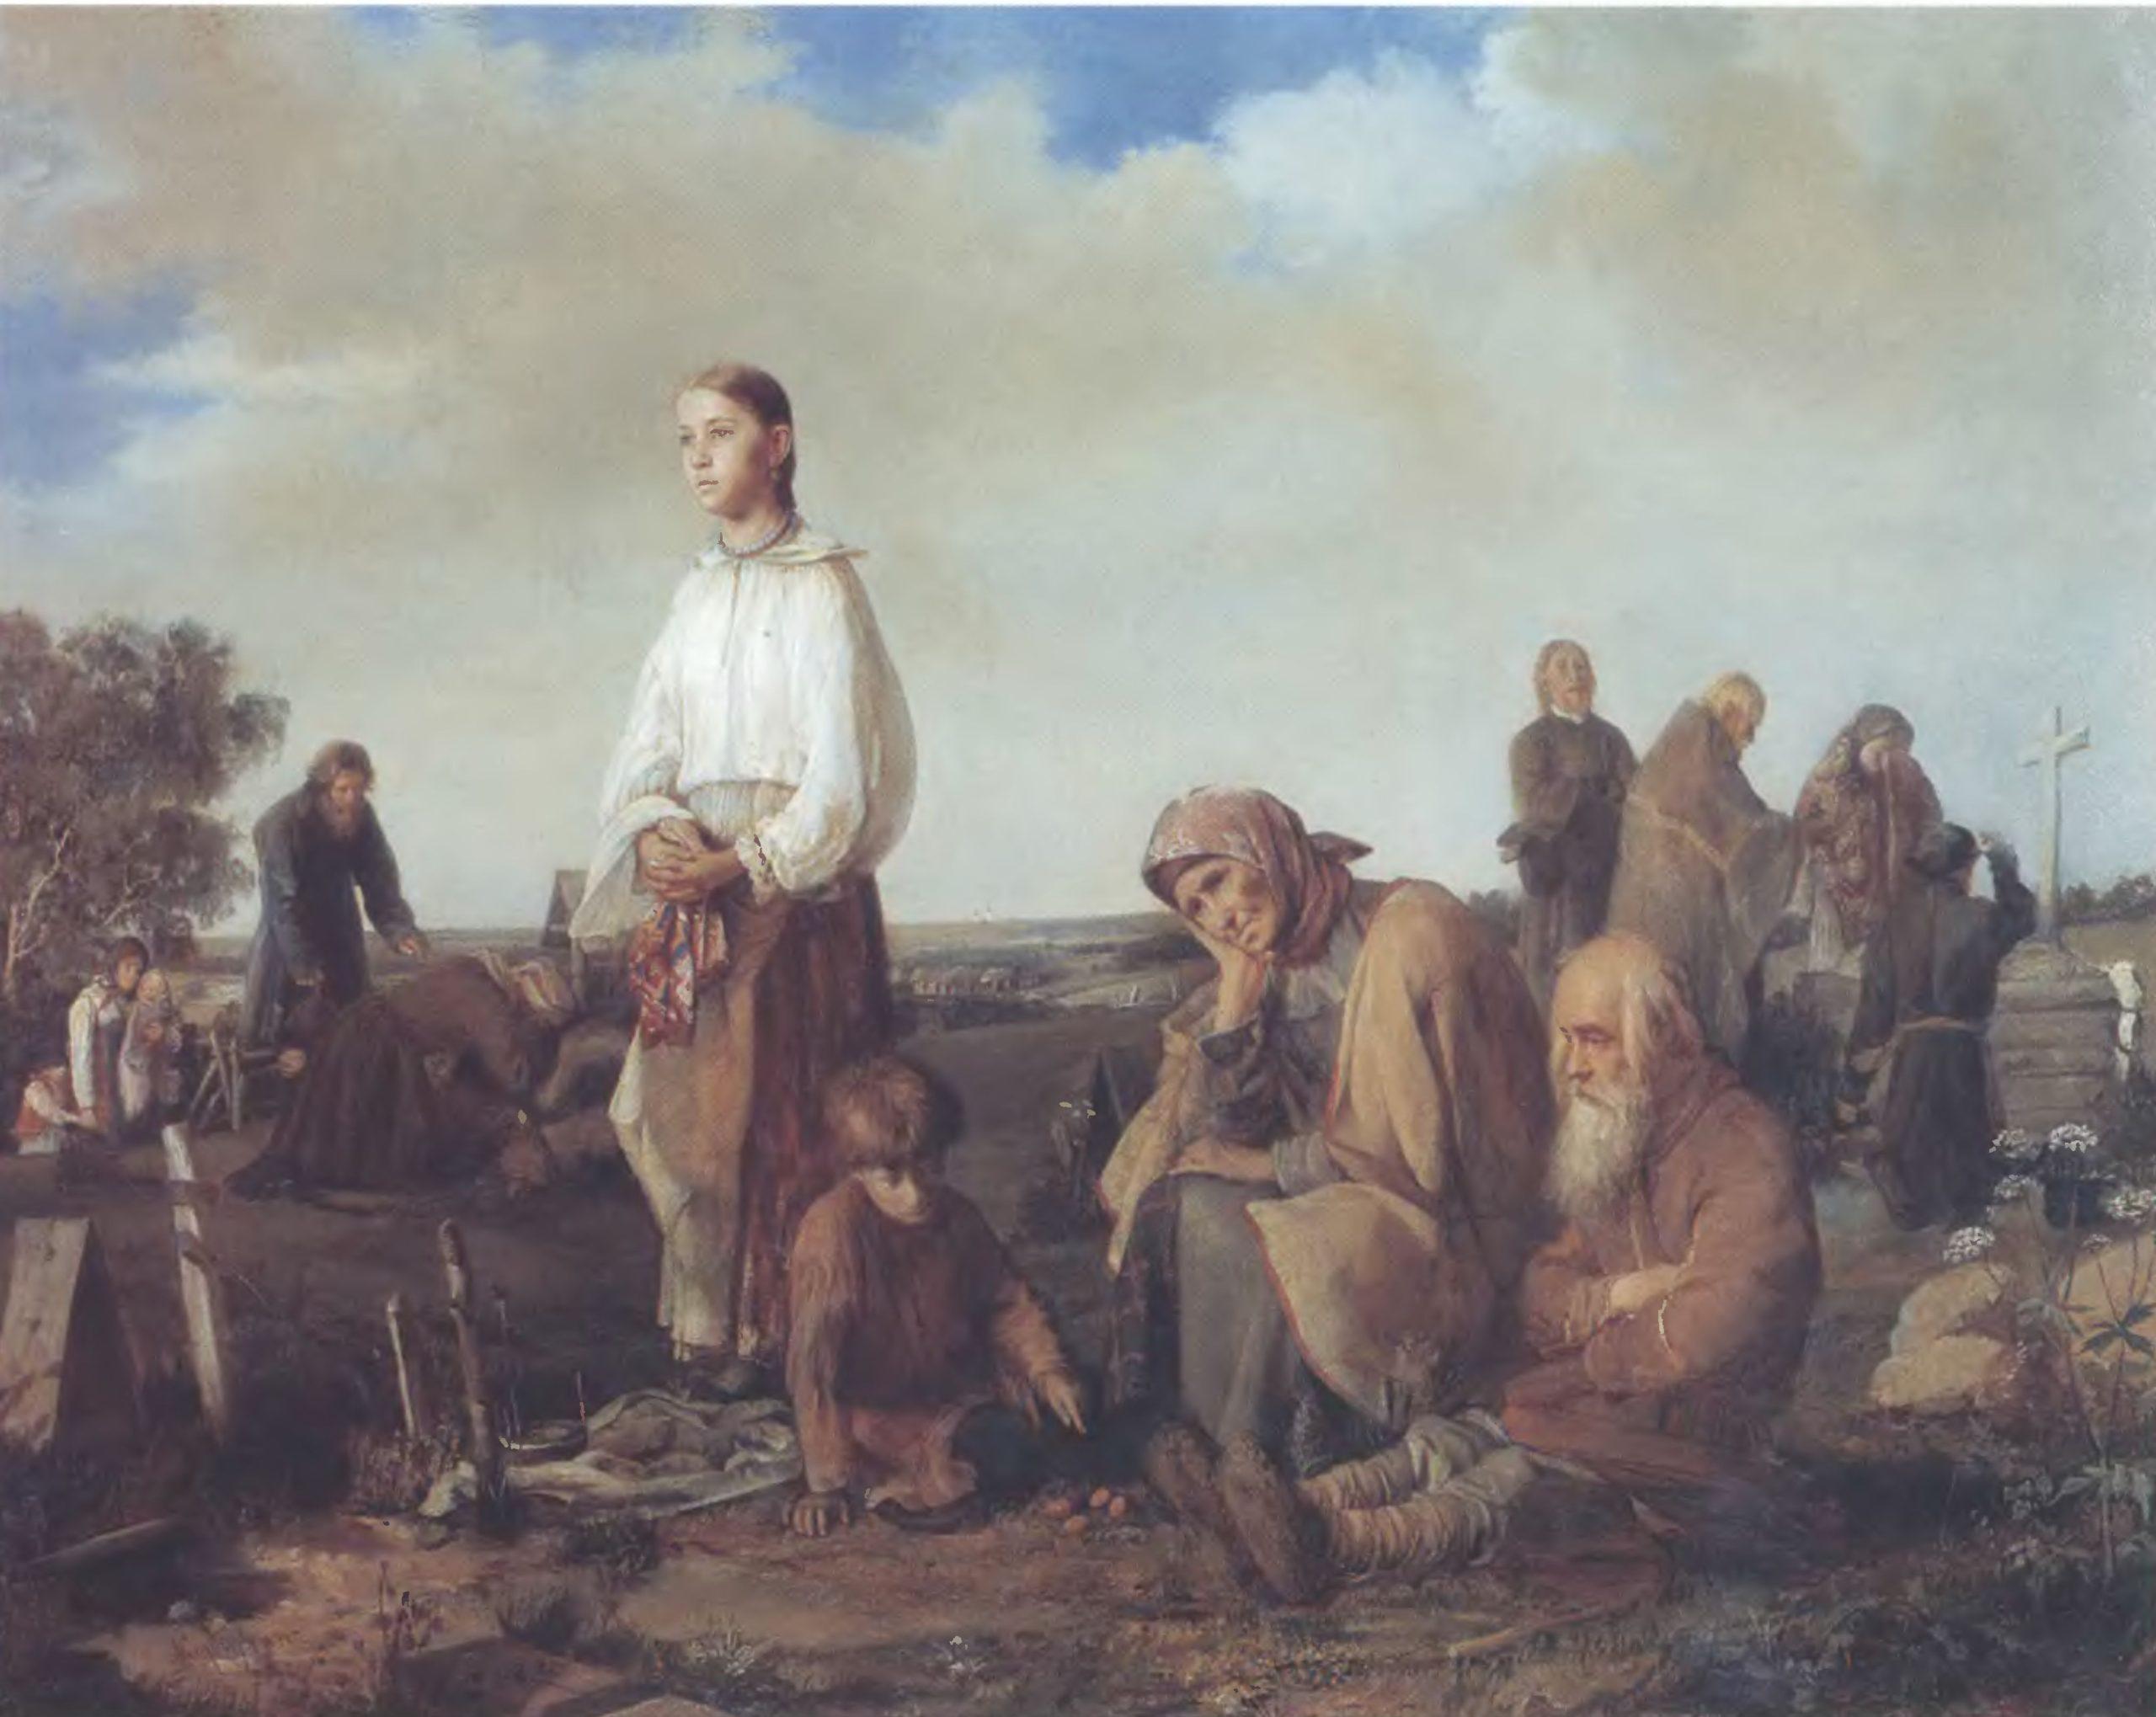 АЛЕКСЕЙ КОРЗУХИН Поминки на кладбище. 1865 Масло, холст. 63,5 х 83 см Государственный Русский музей